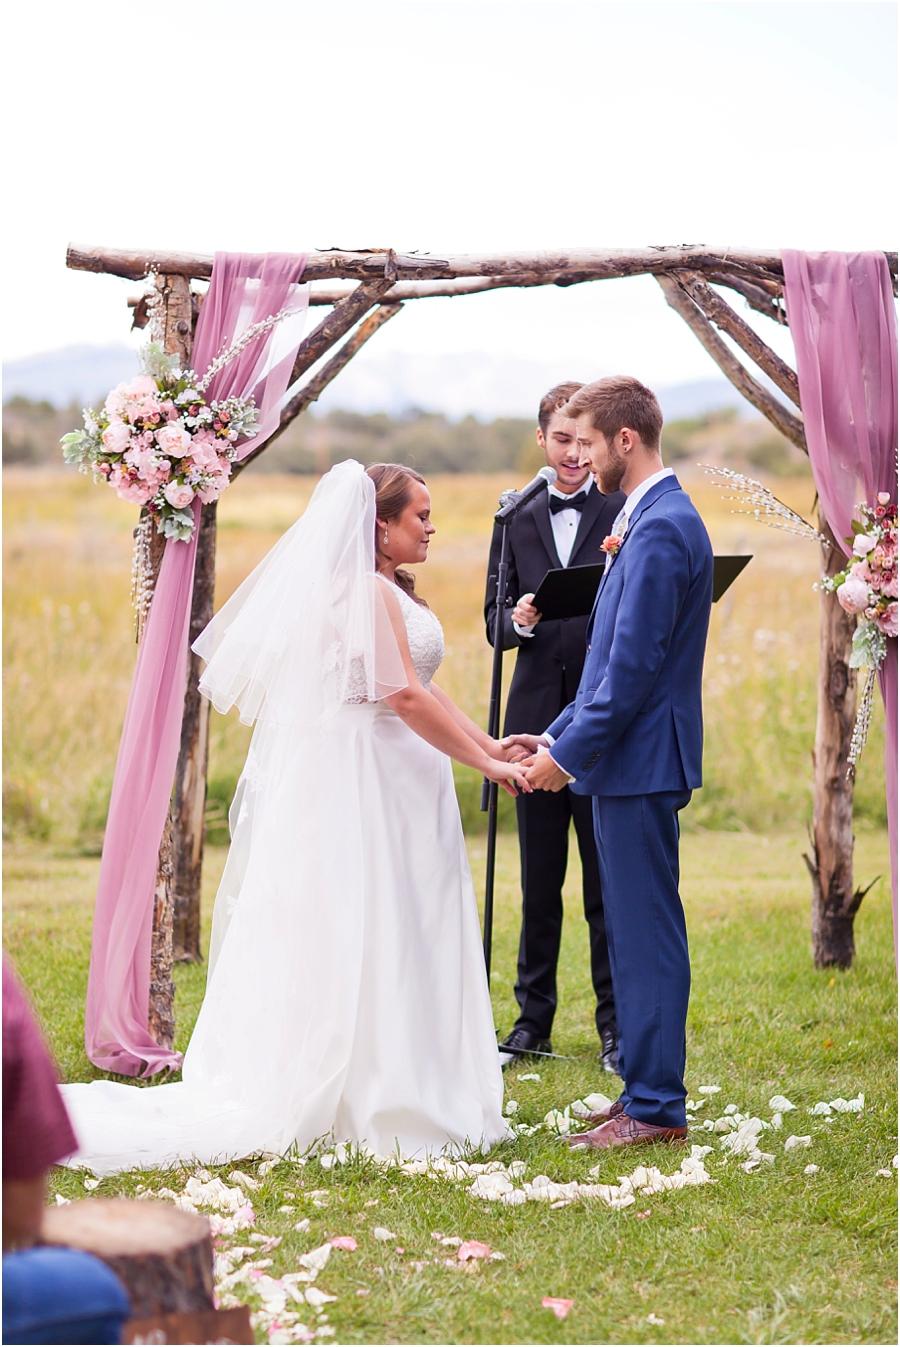 visit-durango-wedding.jpg